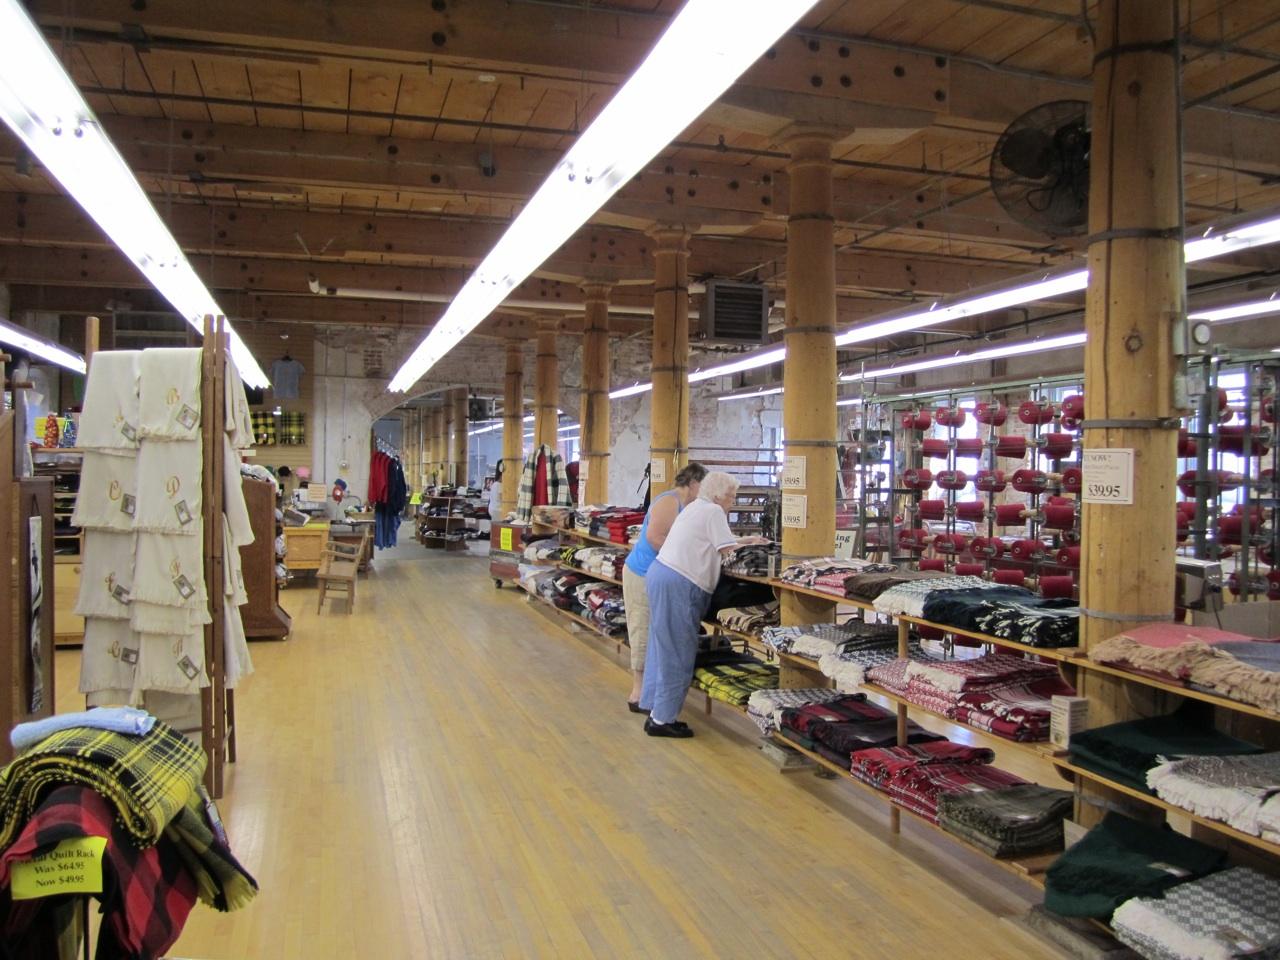 Inside The Amana Woolen Mill